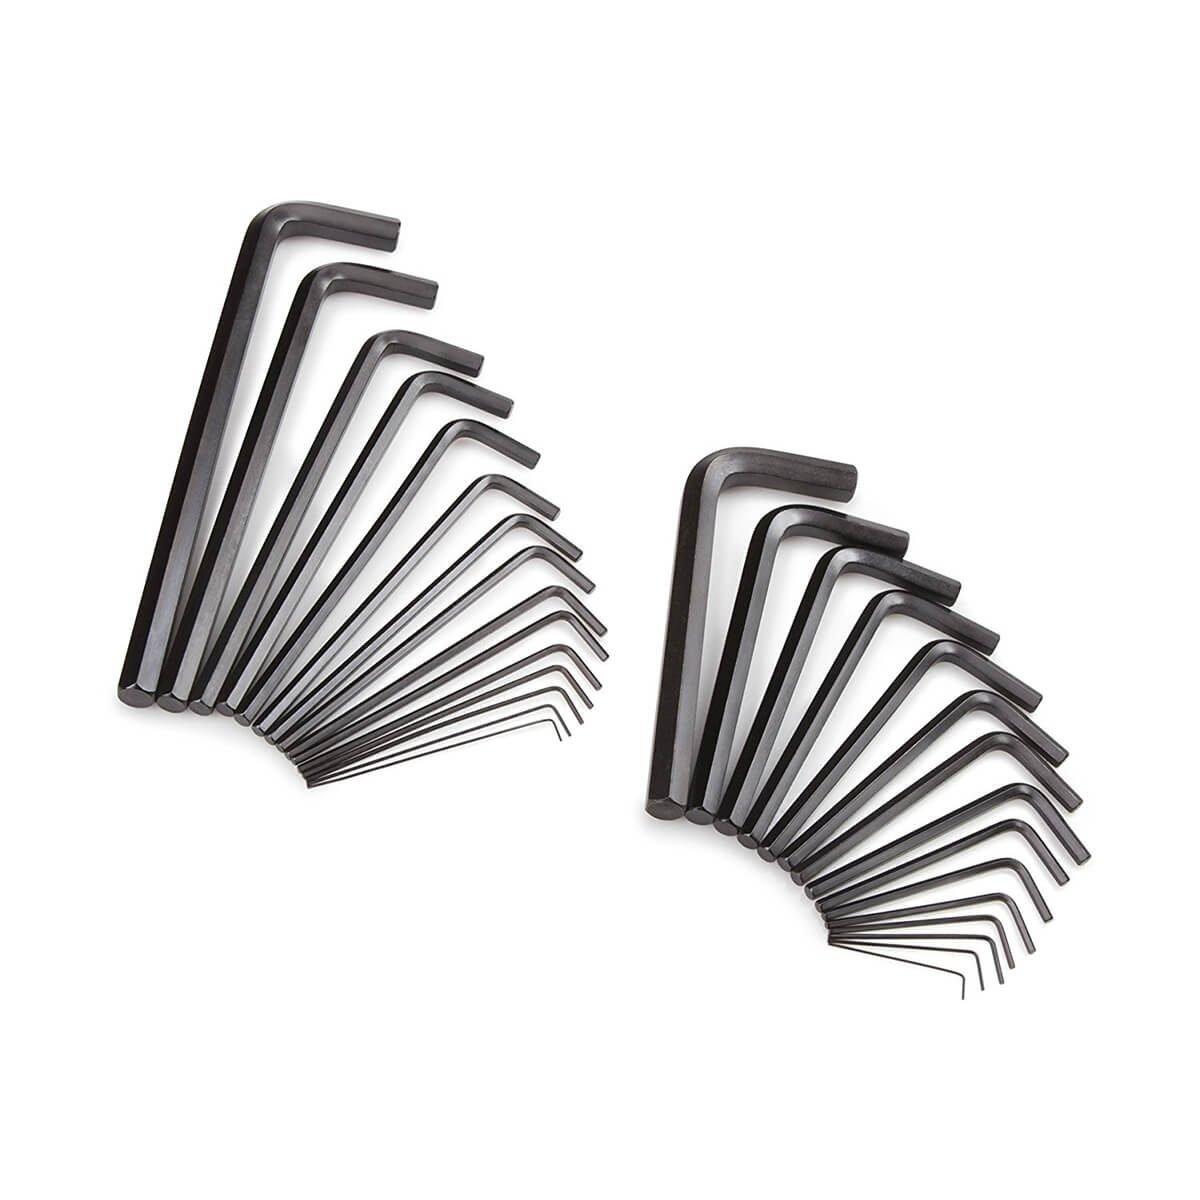 TEKTON Hex Key Wrench Set, Inch/Metric, 30-Piece